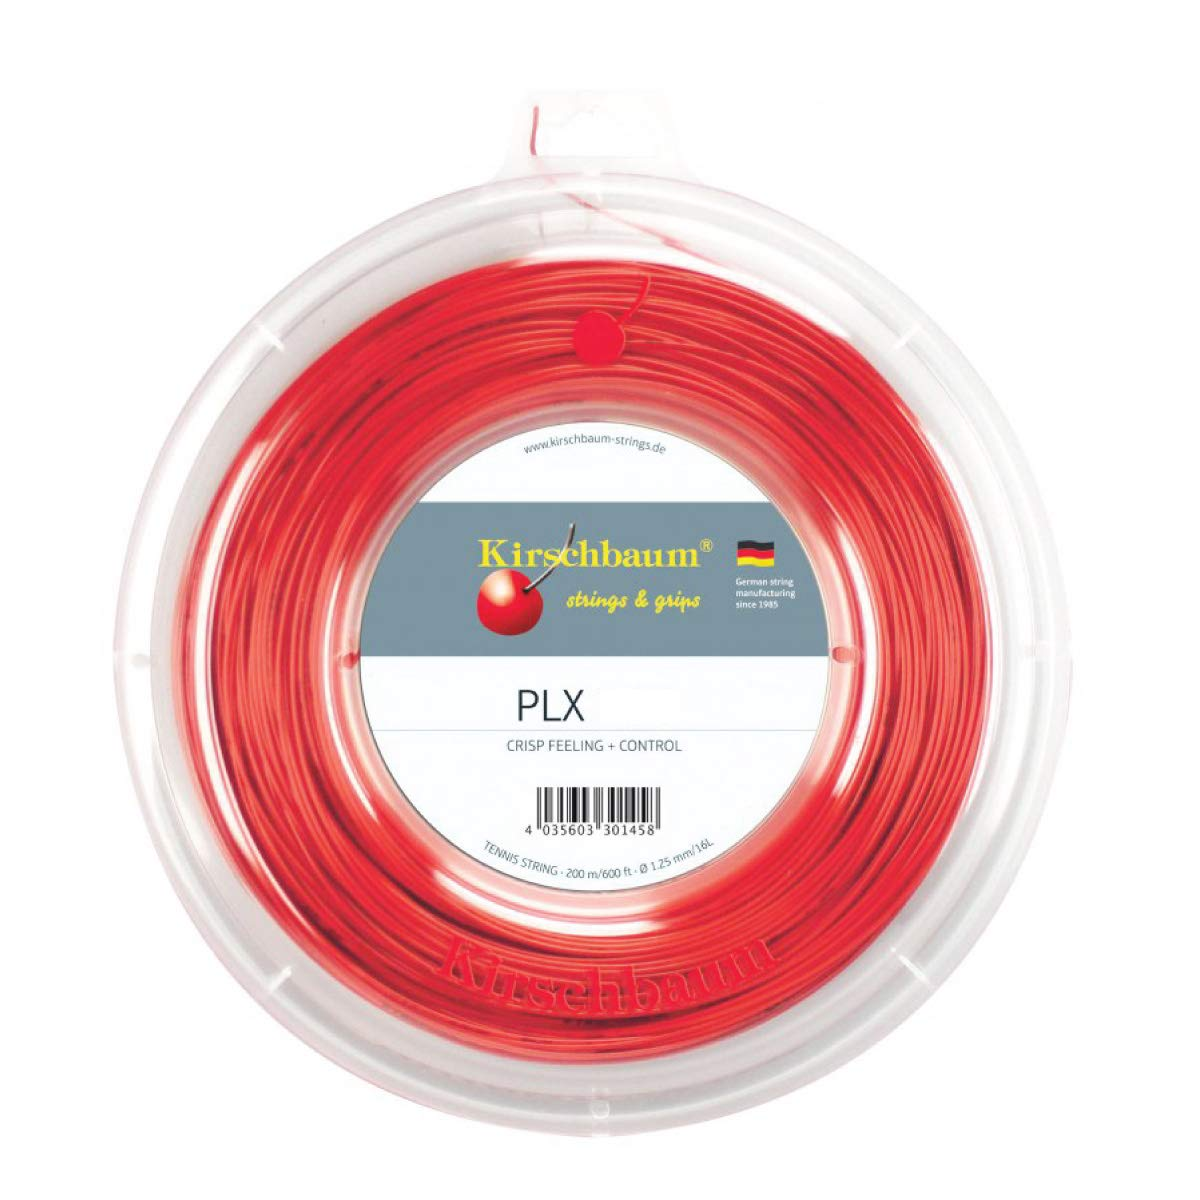 Bobine cordage de tennis Rouge PLX 1,25 mm x 200 M